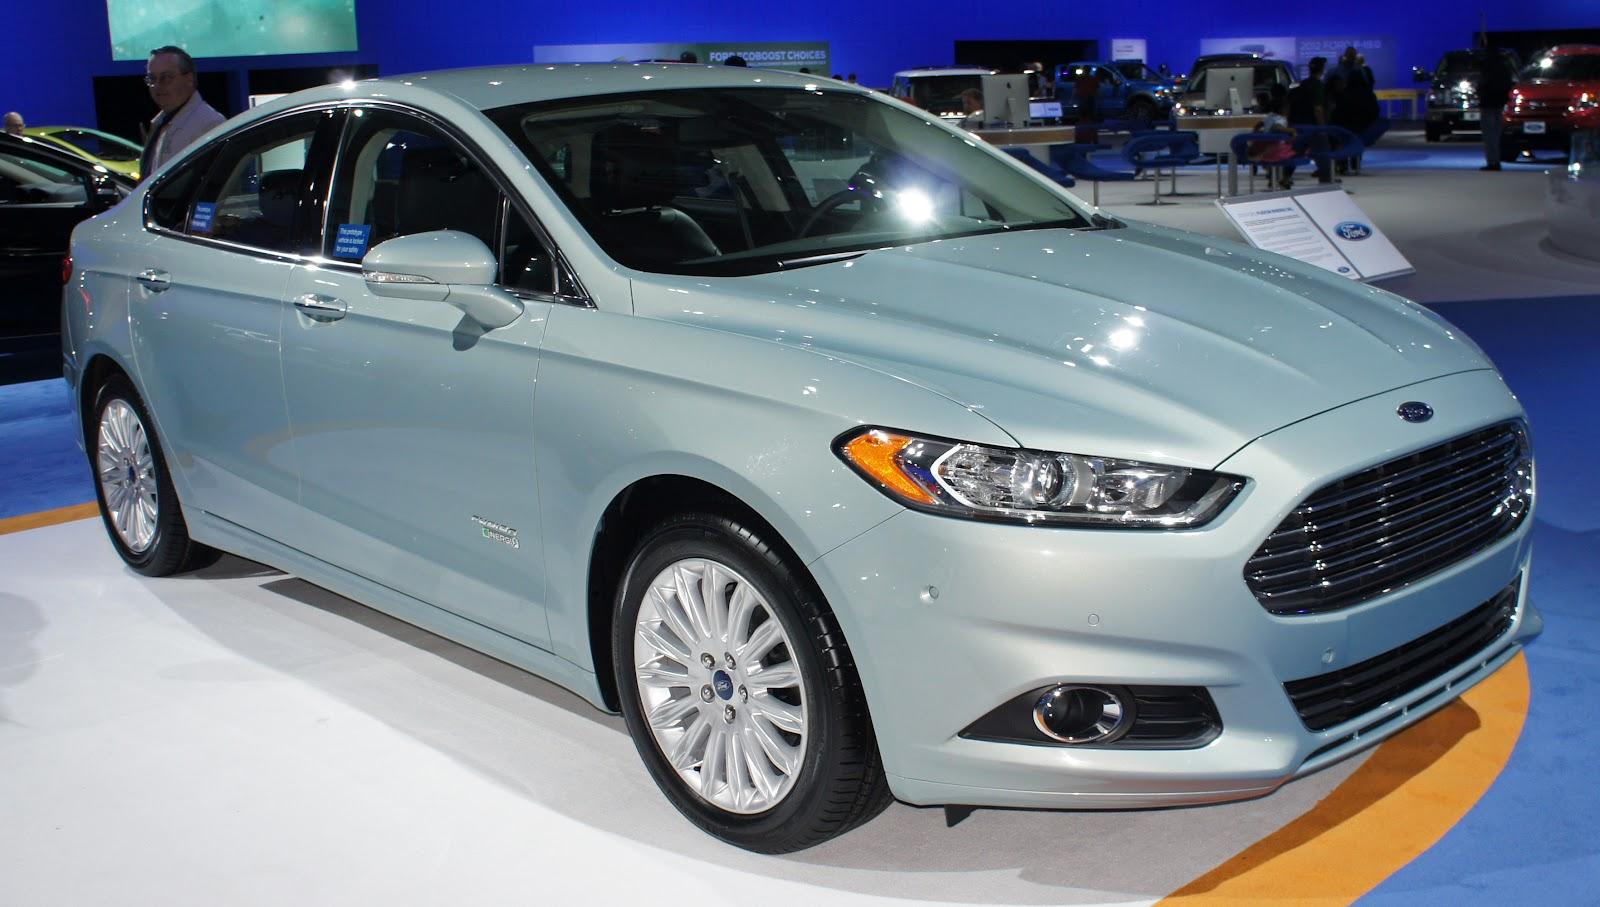 Photo of Ford Energi sedan: 69% 5-year depreciation rate